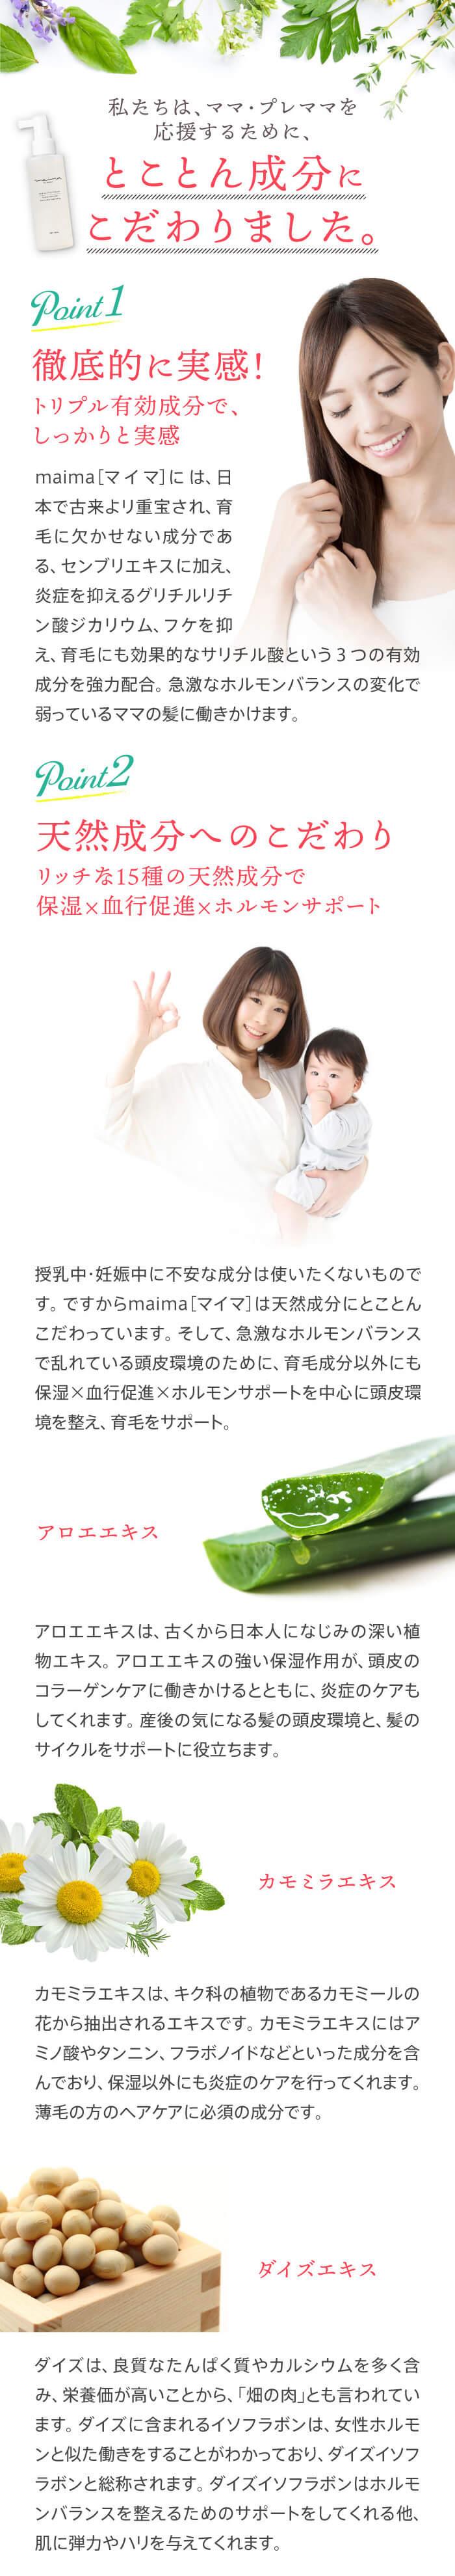 【育毛剤】女性用育毛剤 産後の抜け毛対策